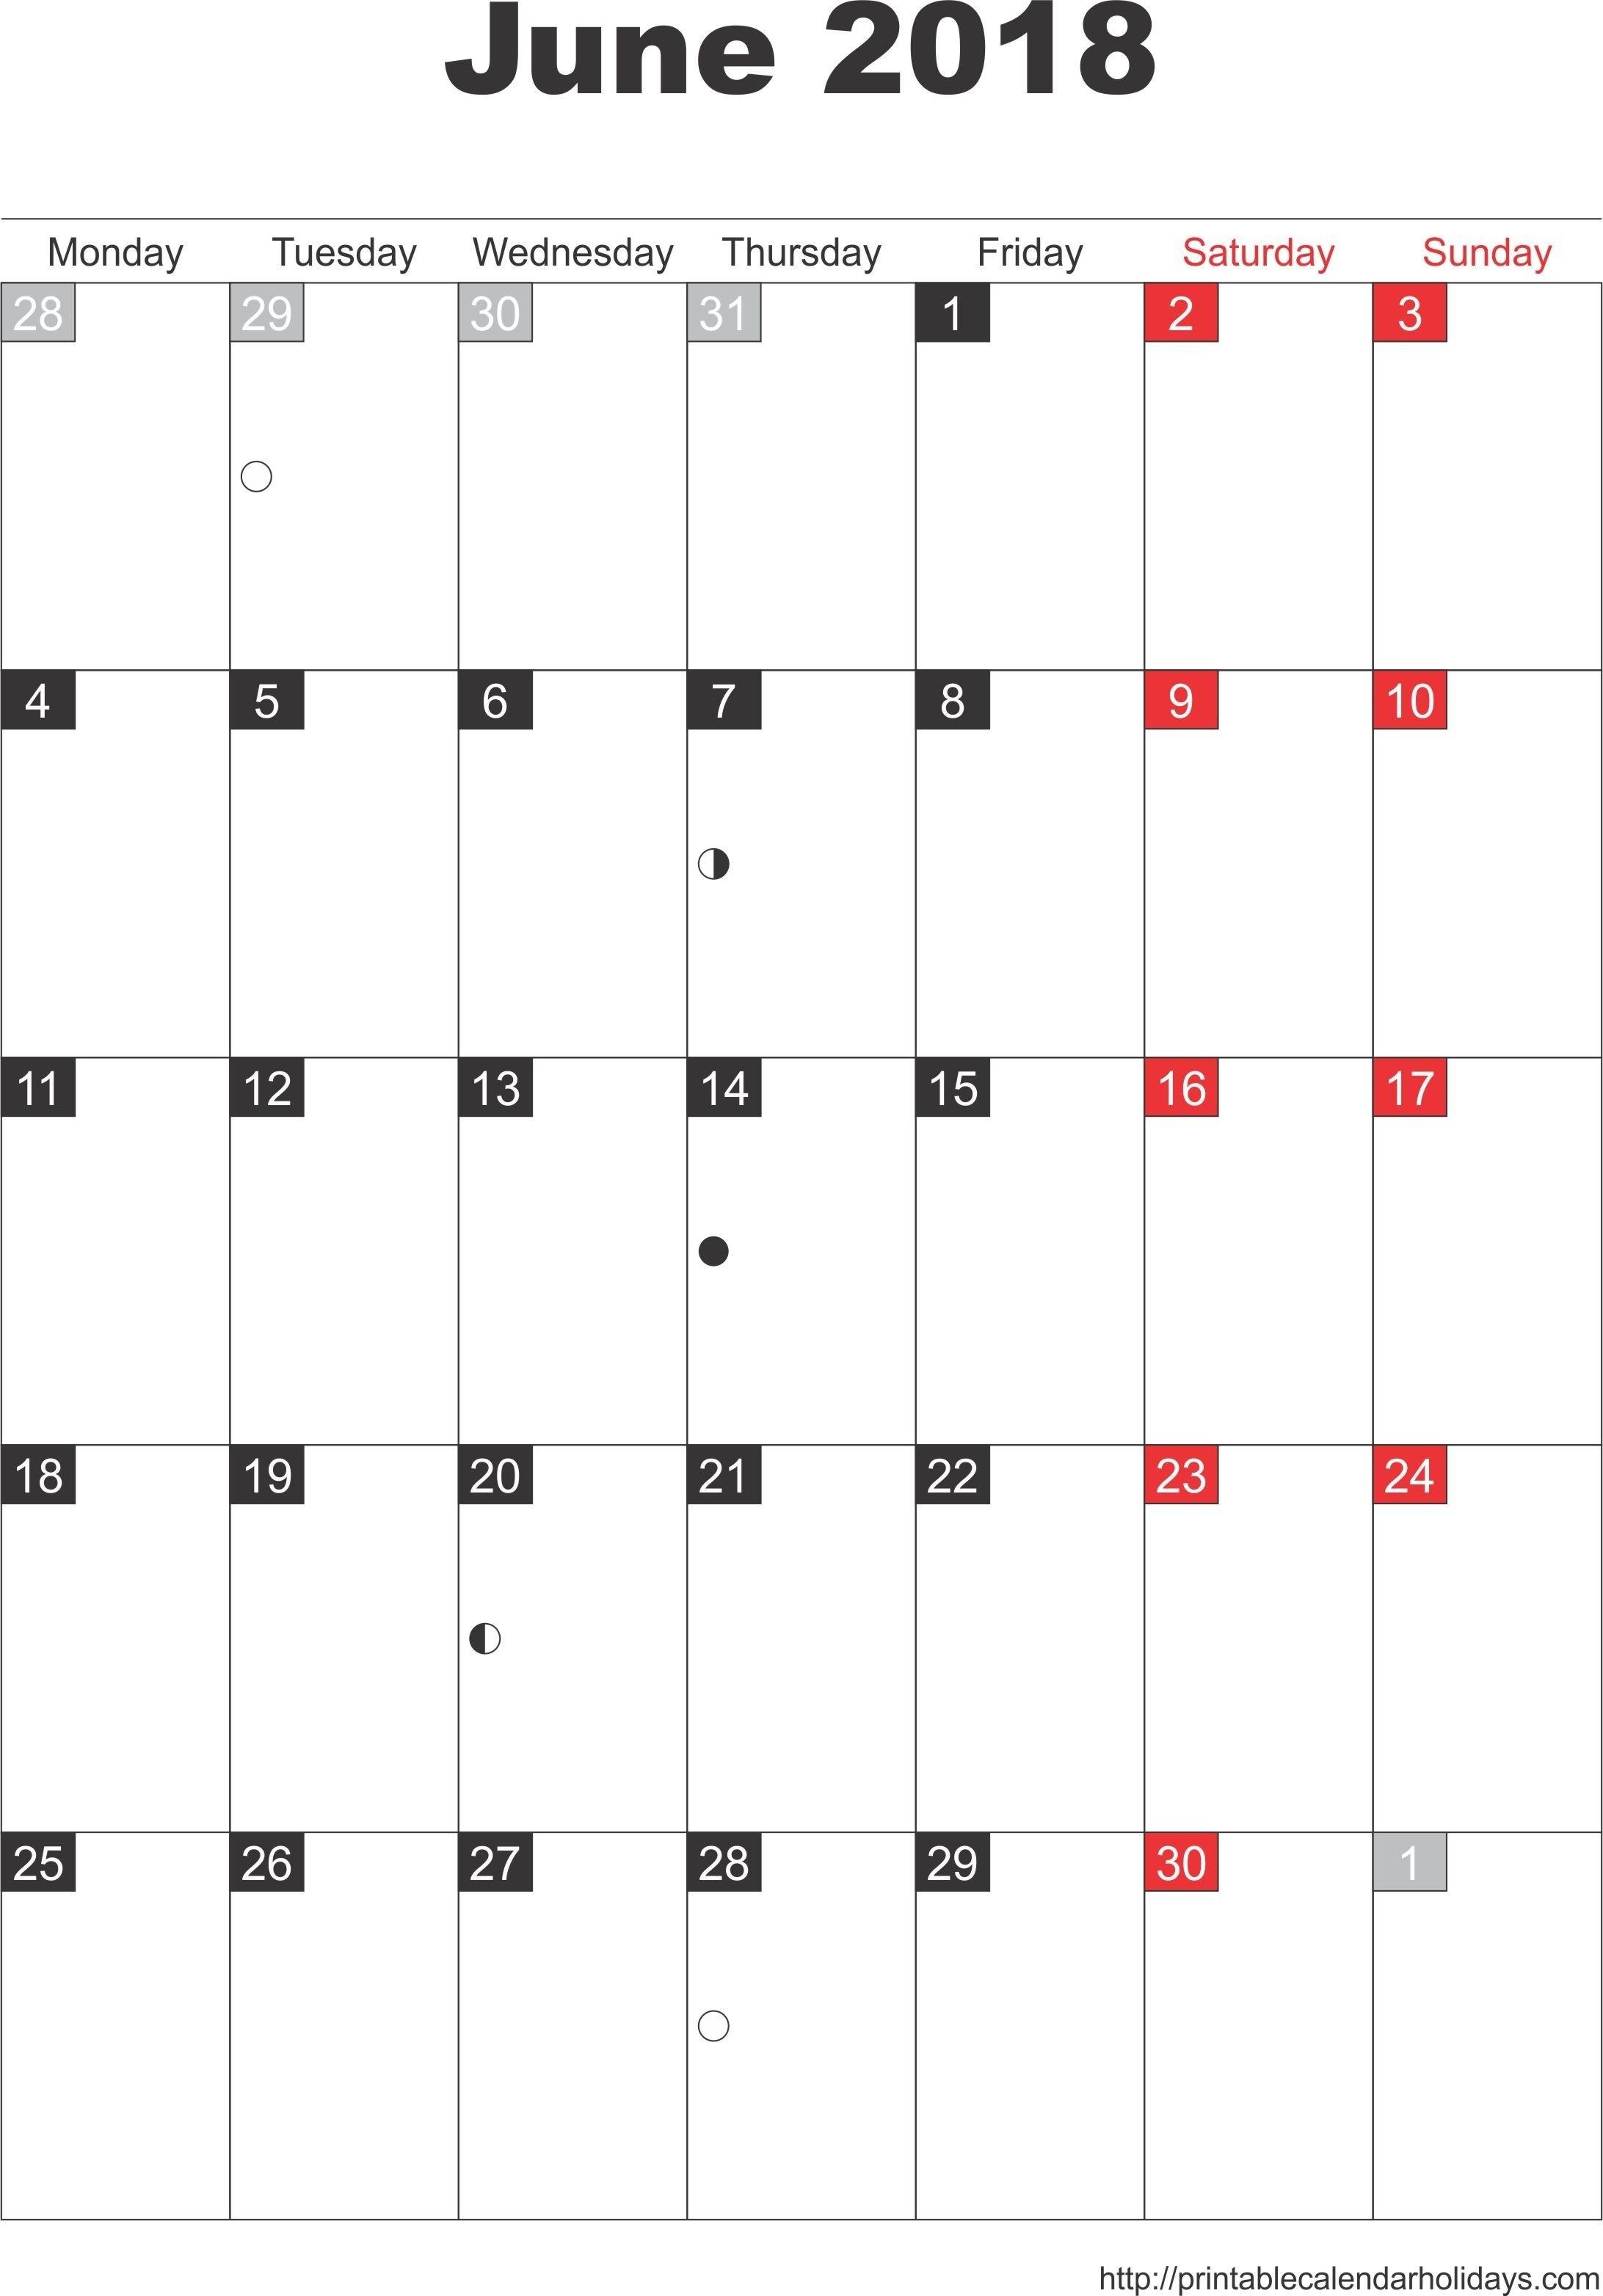 December 2018 Calendar Printable 8X11 | Holidays Calendar Template 2019 Calendar 8X11